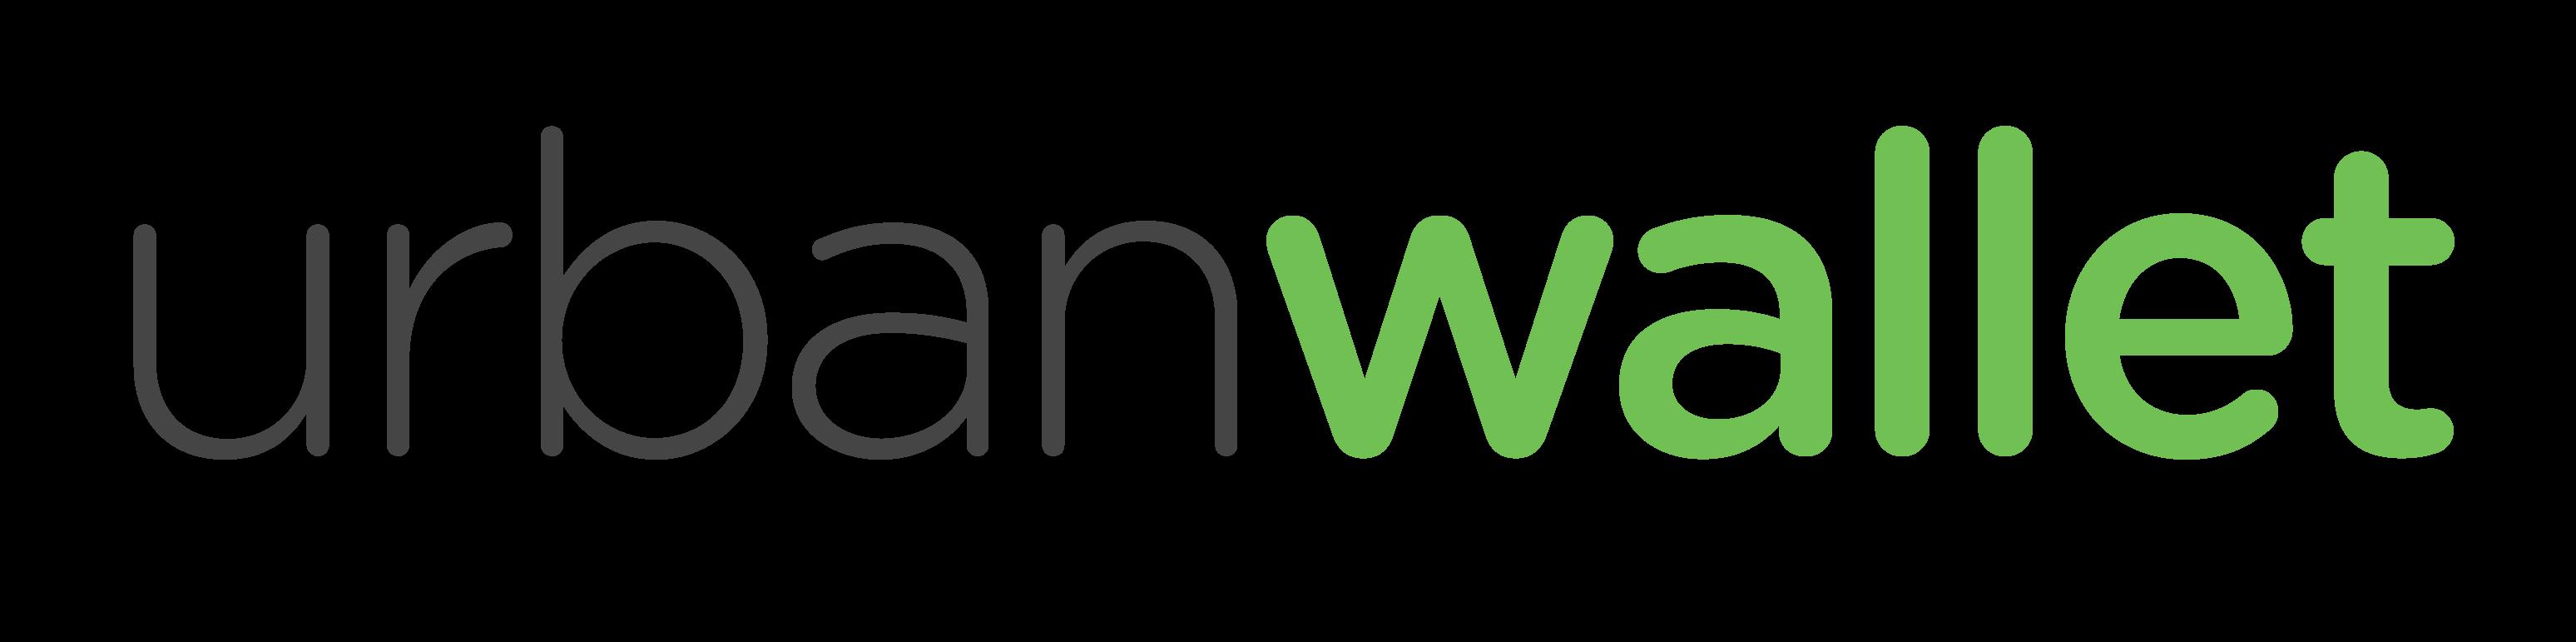 urban wallet logo, grey and green, transparent background